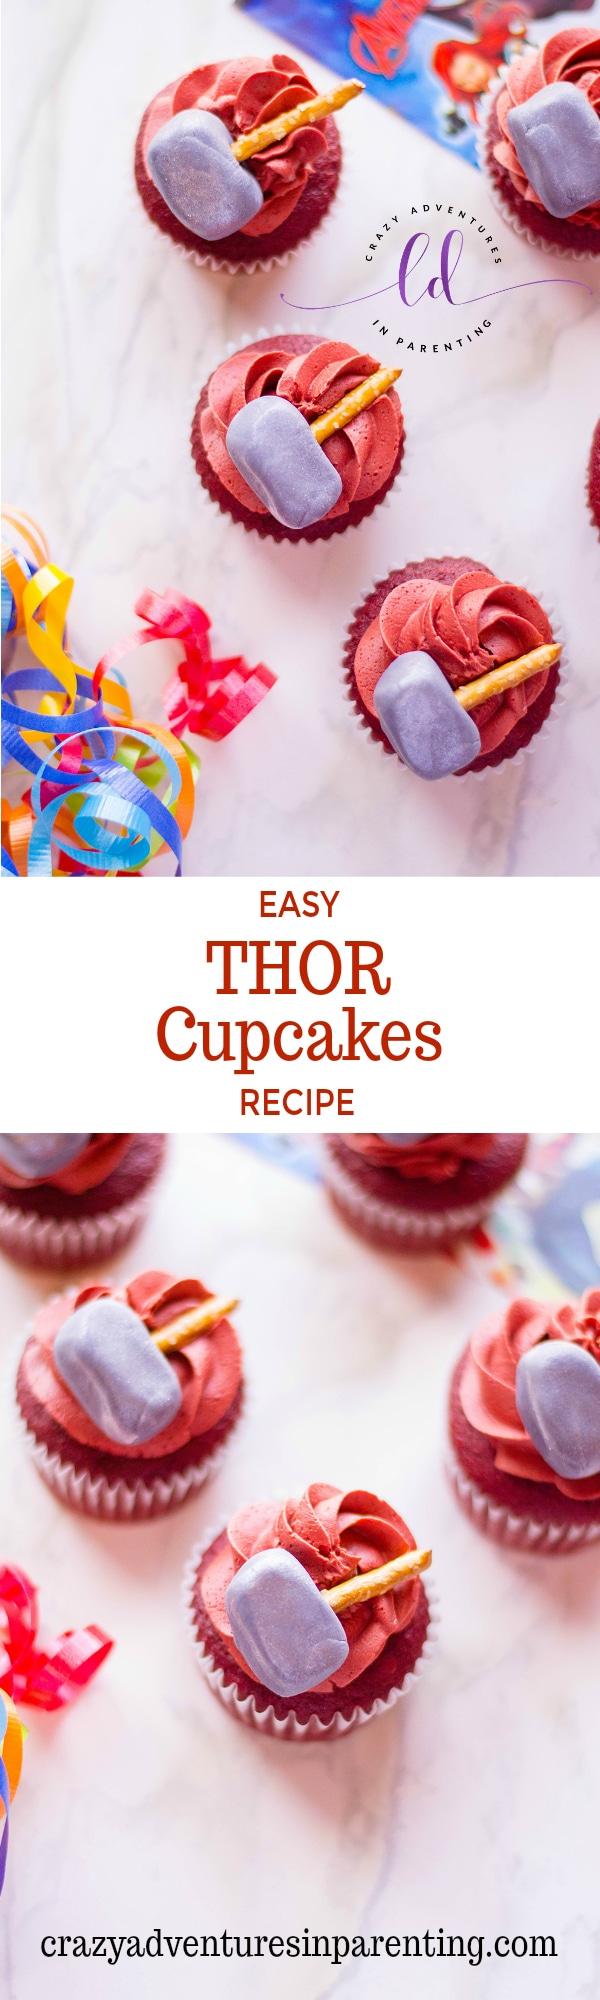 Easy Thor Cupcakes Recipe